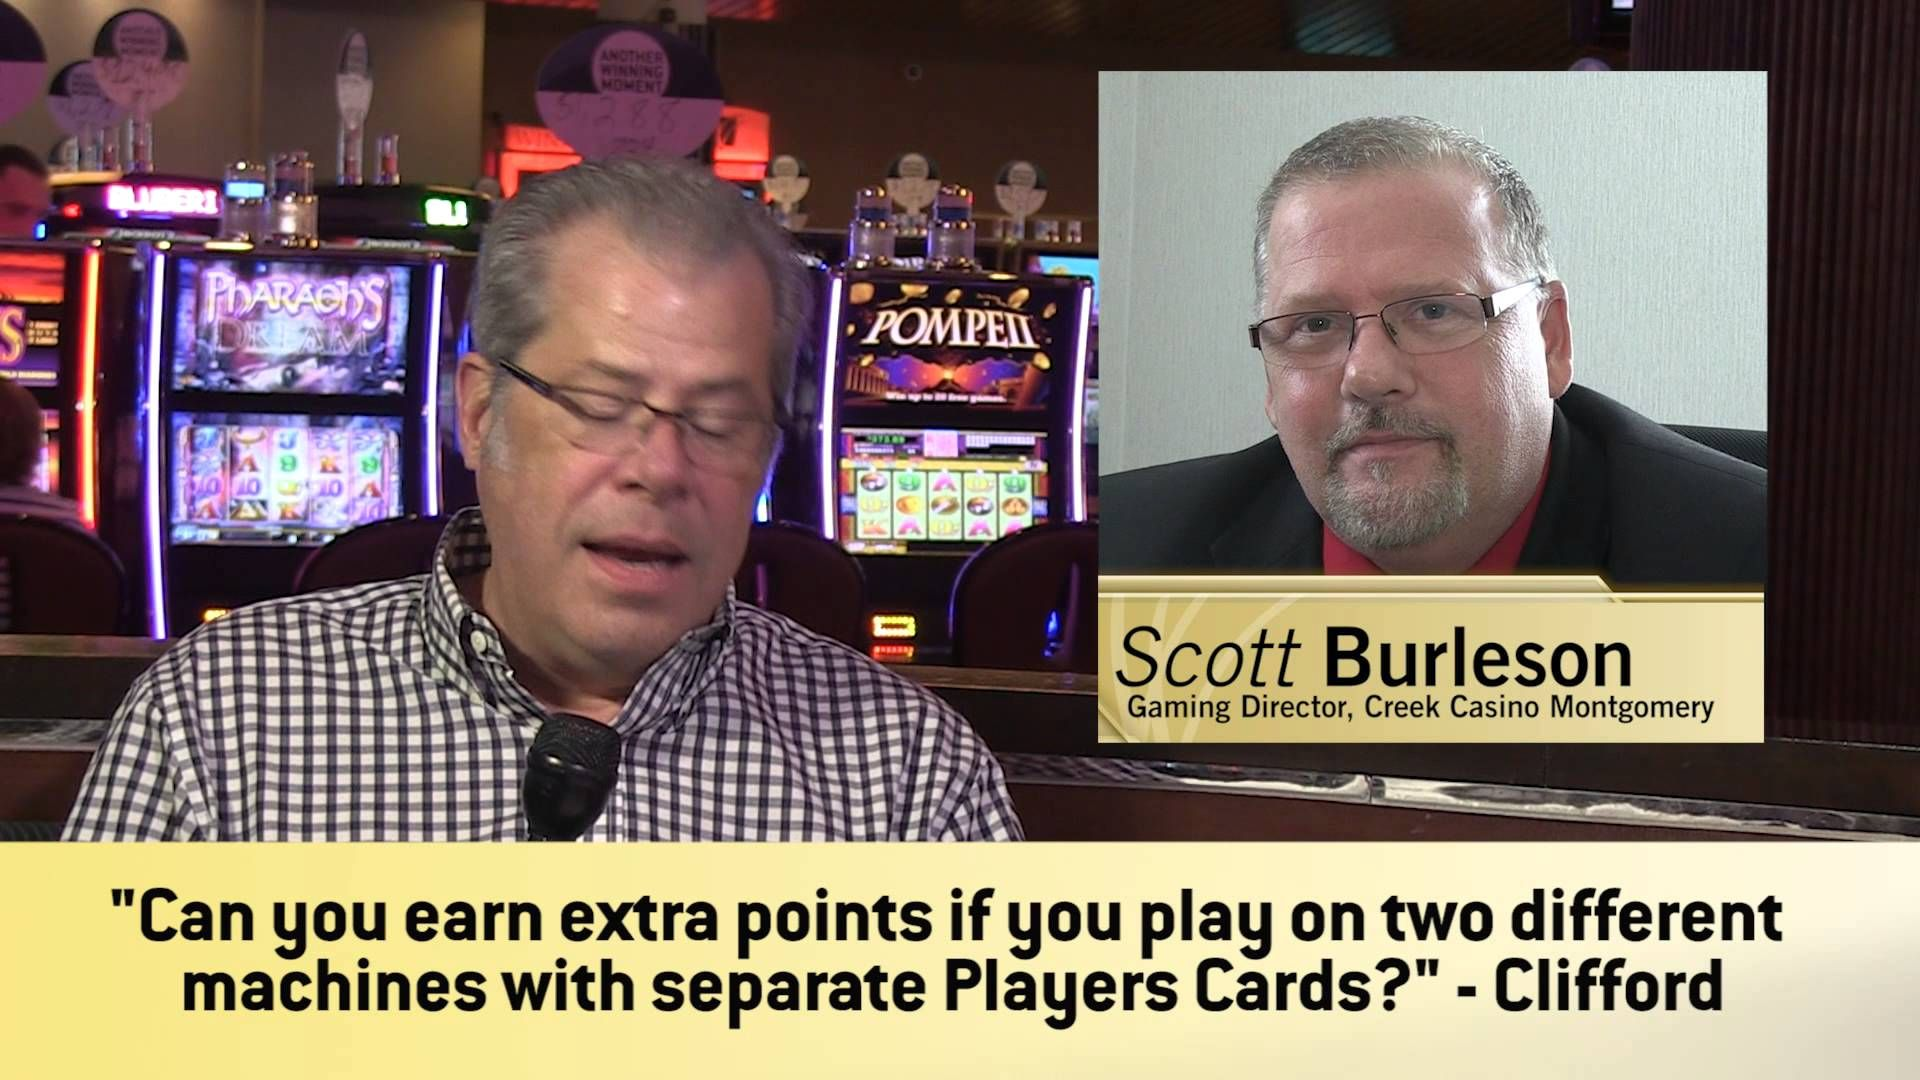 11++ Wind creek casino atmore online games ideas